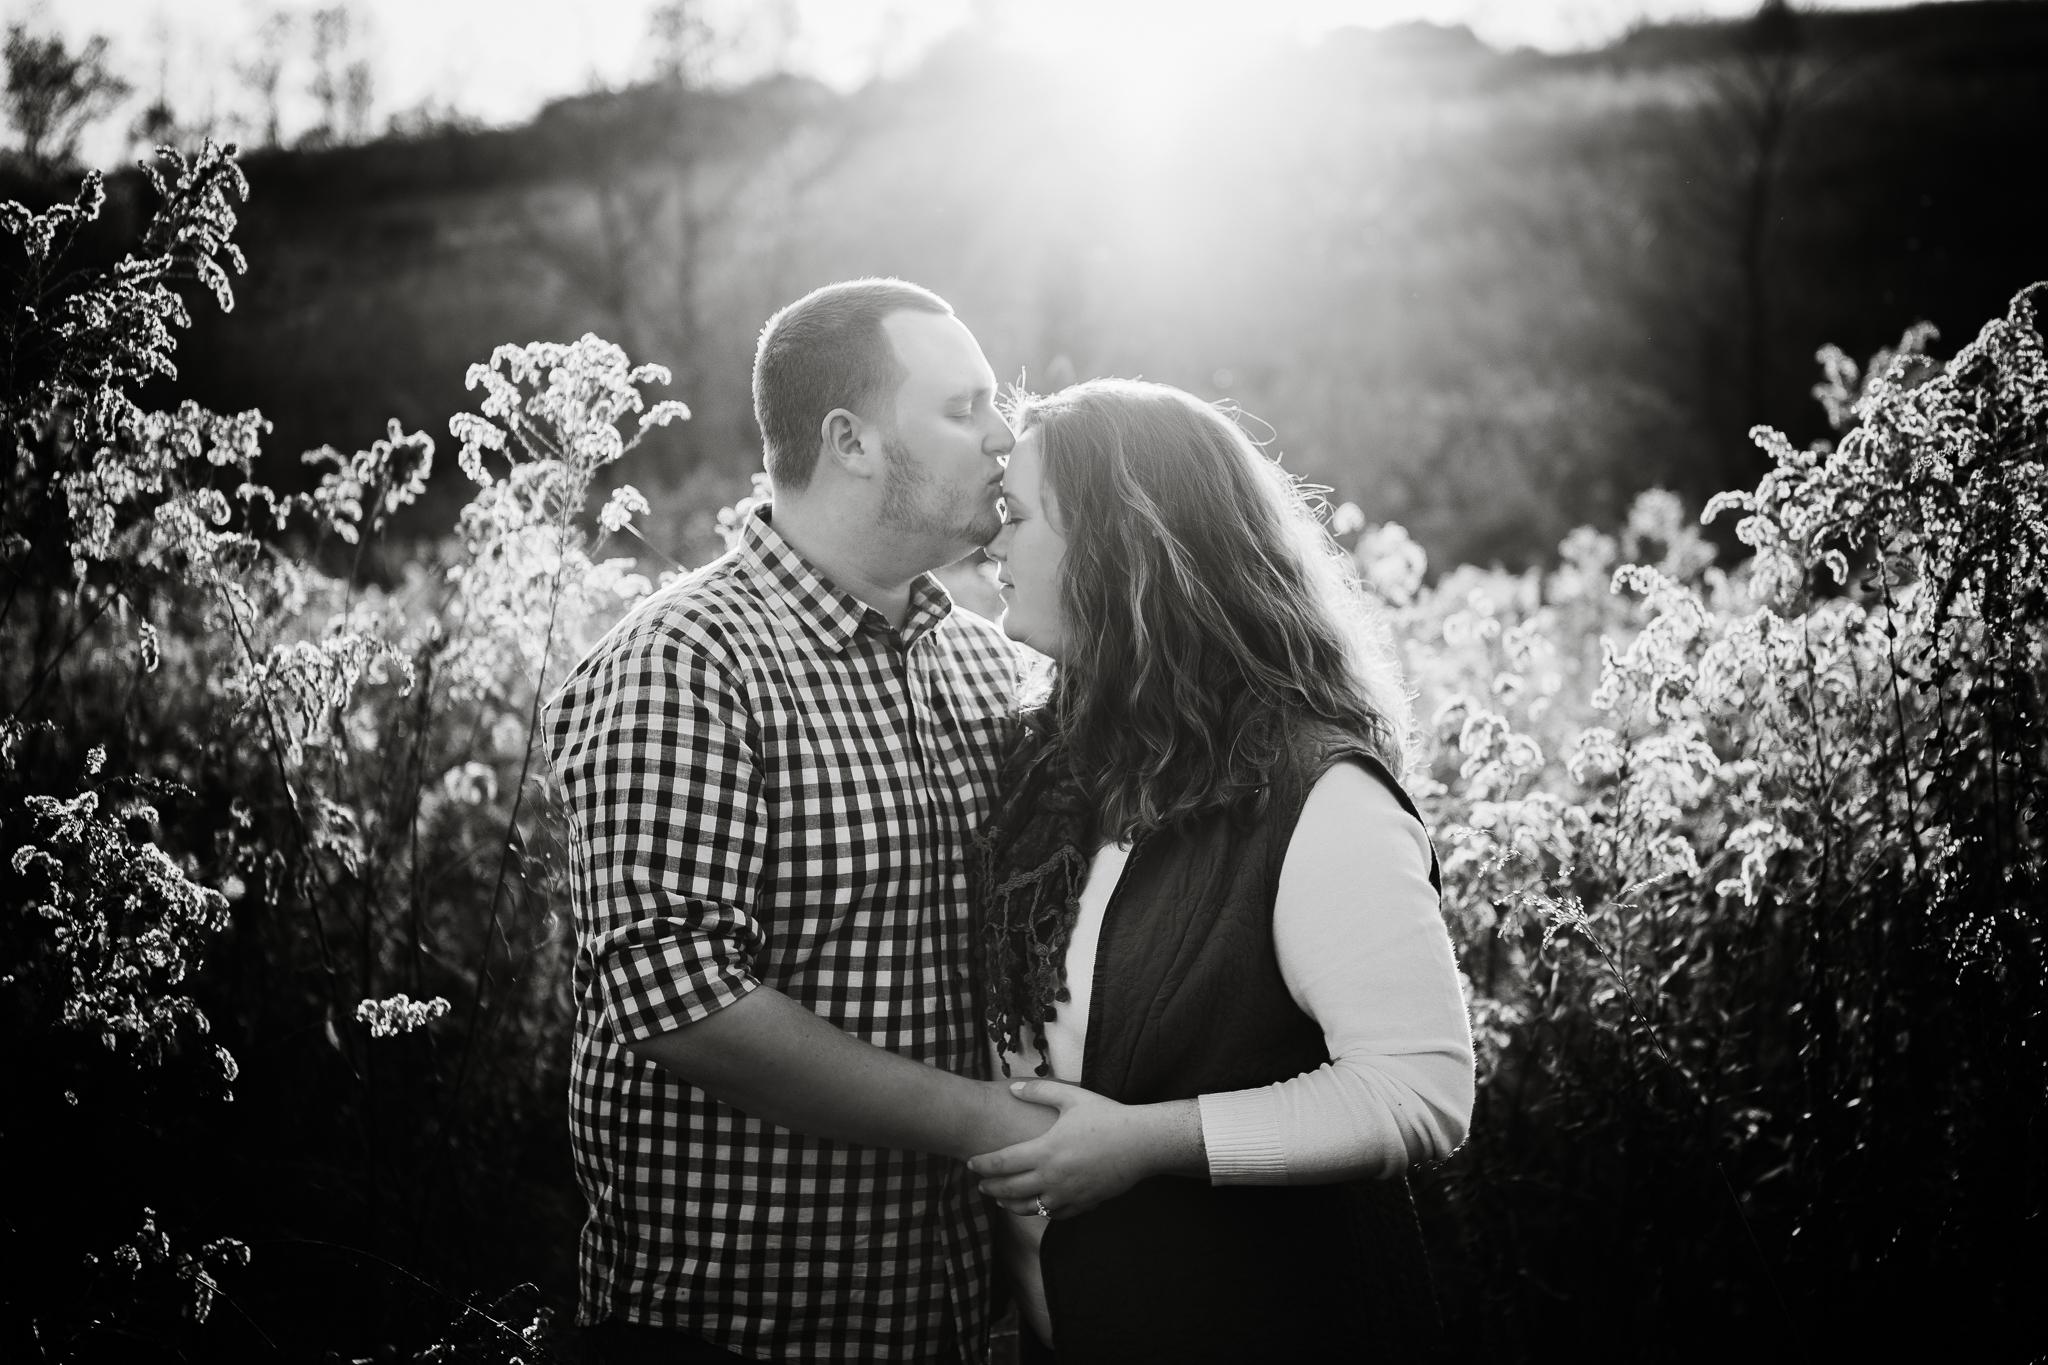 Richmond Kentucky Engagement Photographer - Ariana Jordan Photography -26.jpg